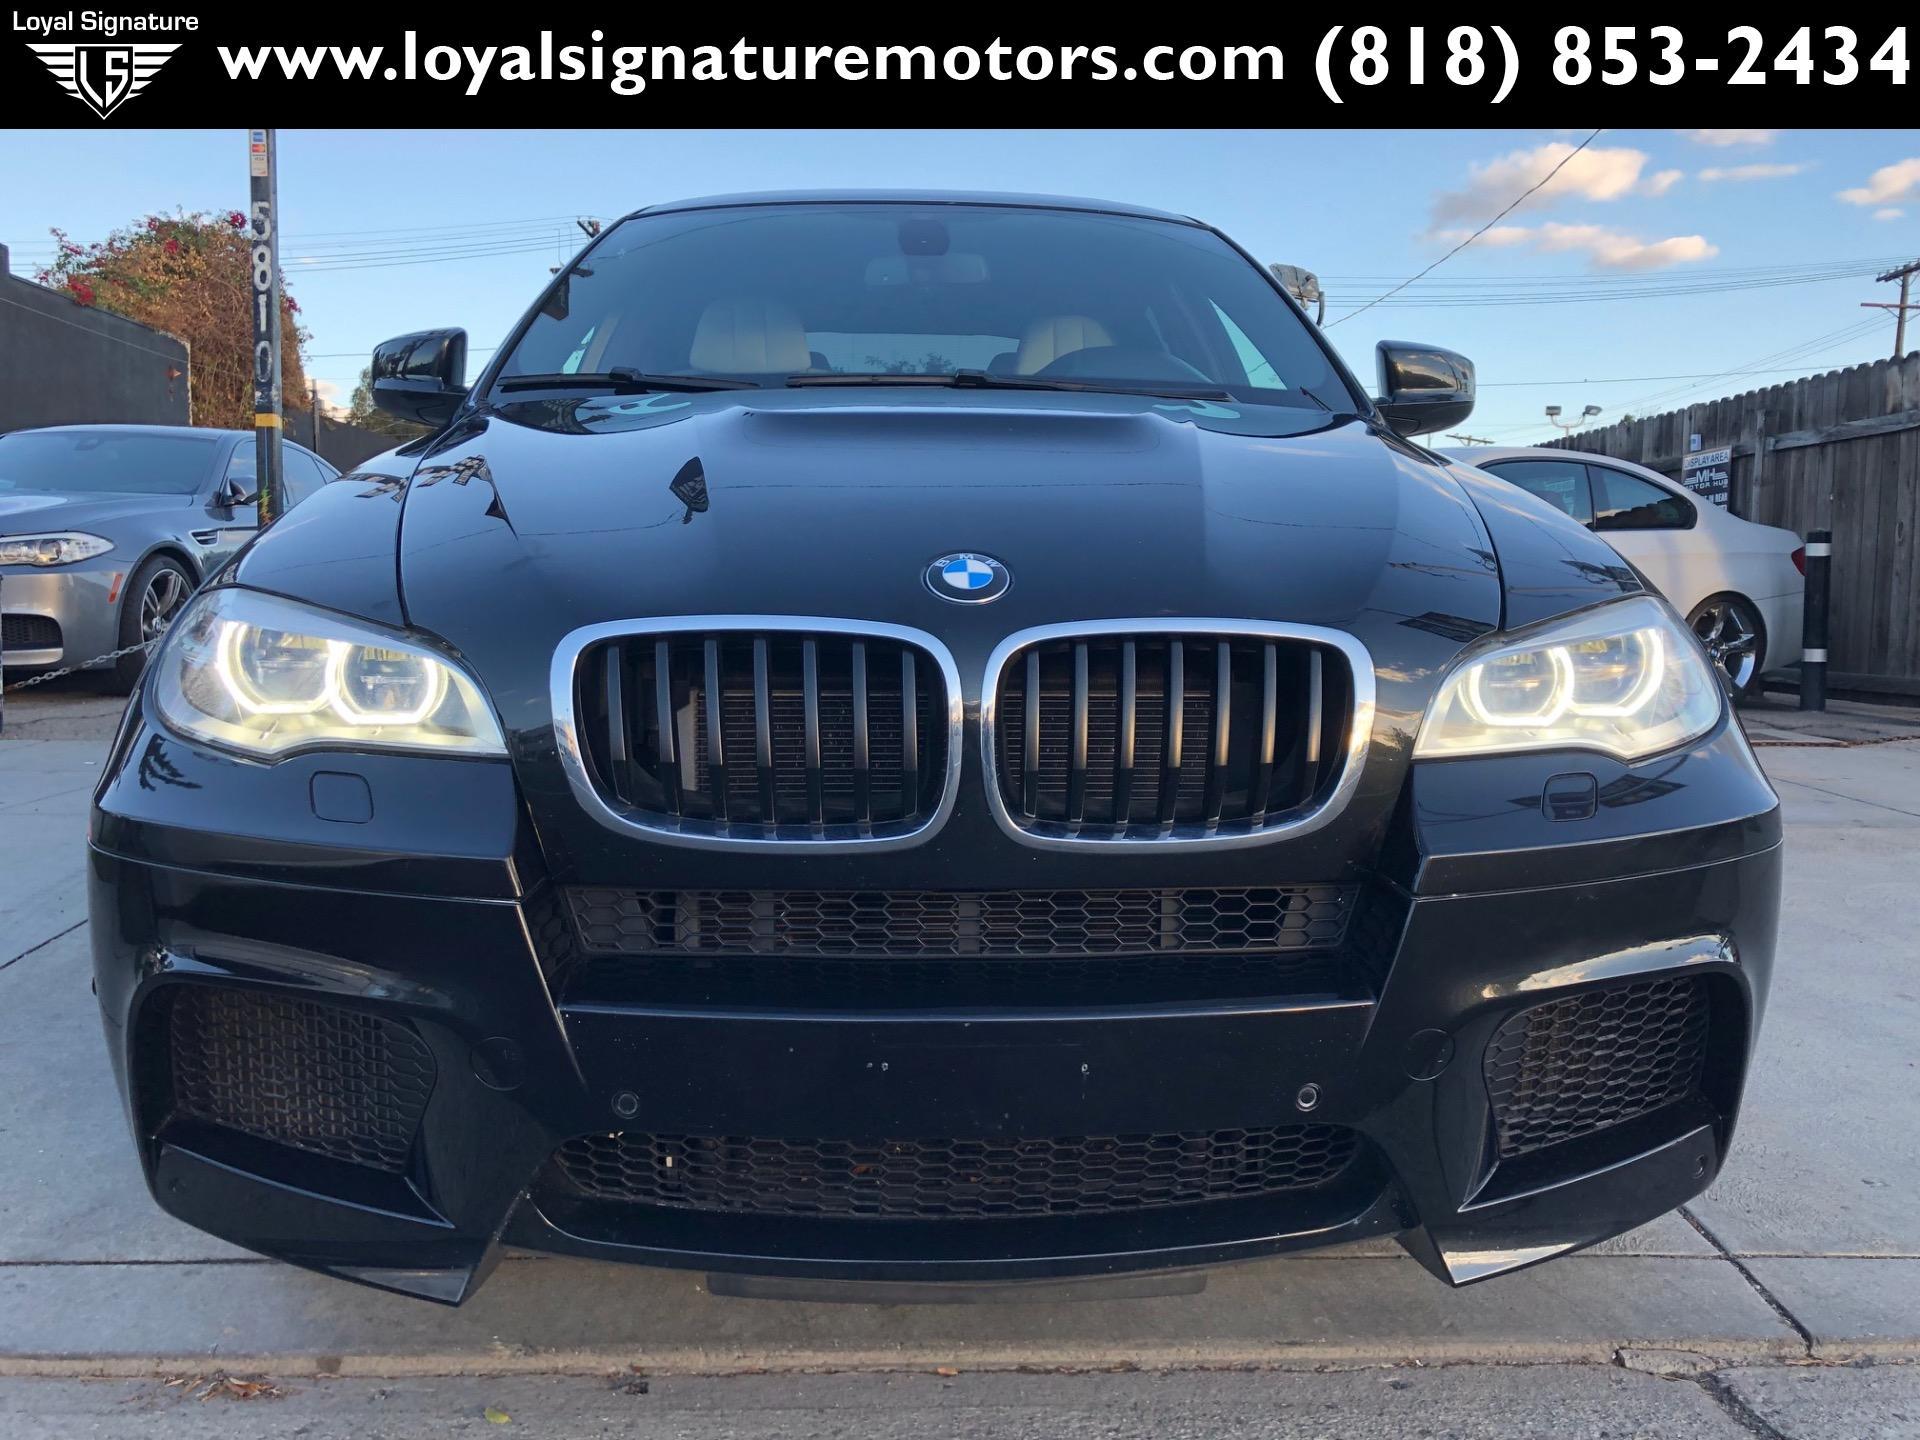 Used-2013-BMW-X6-M